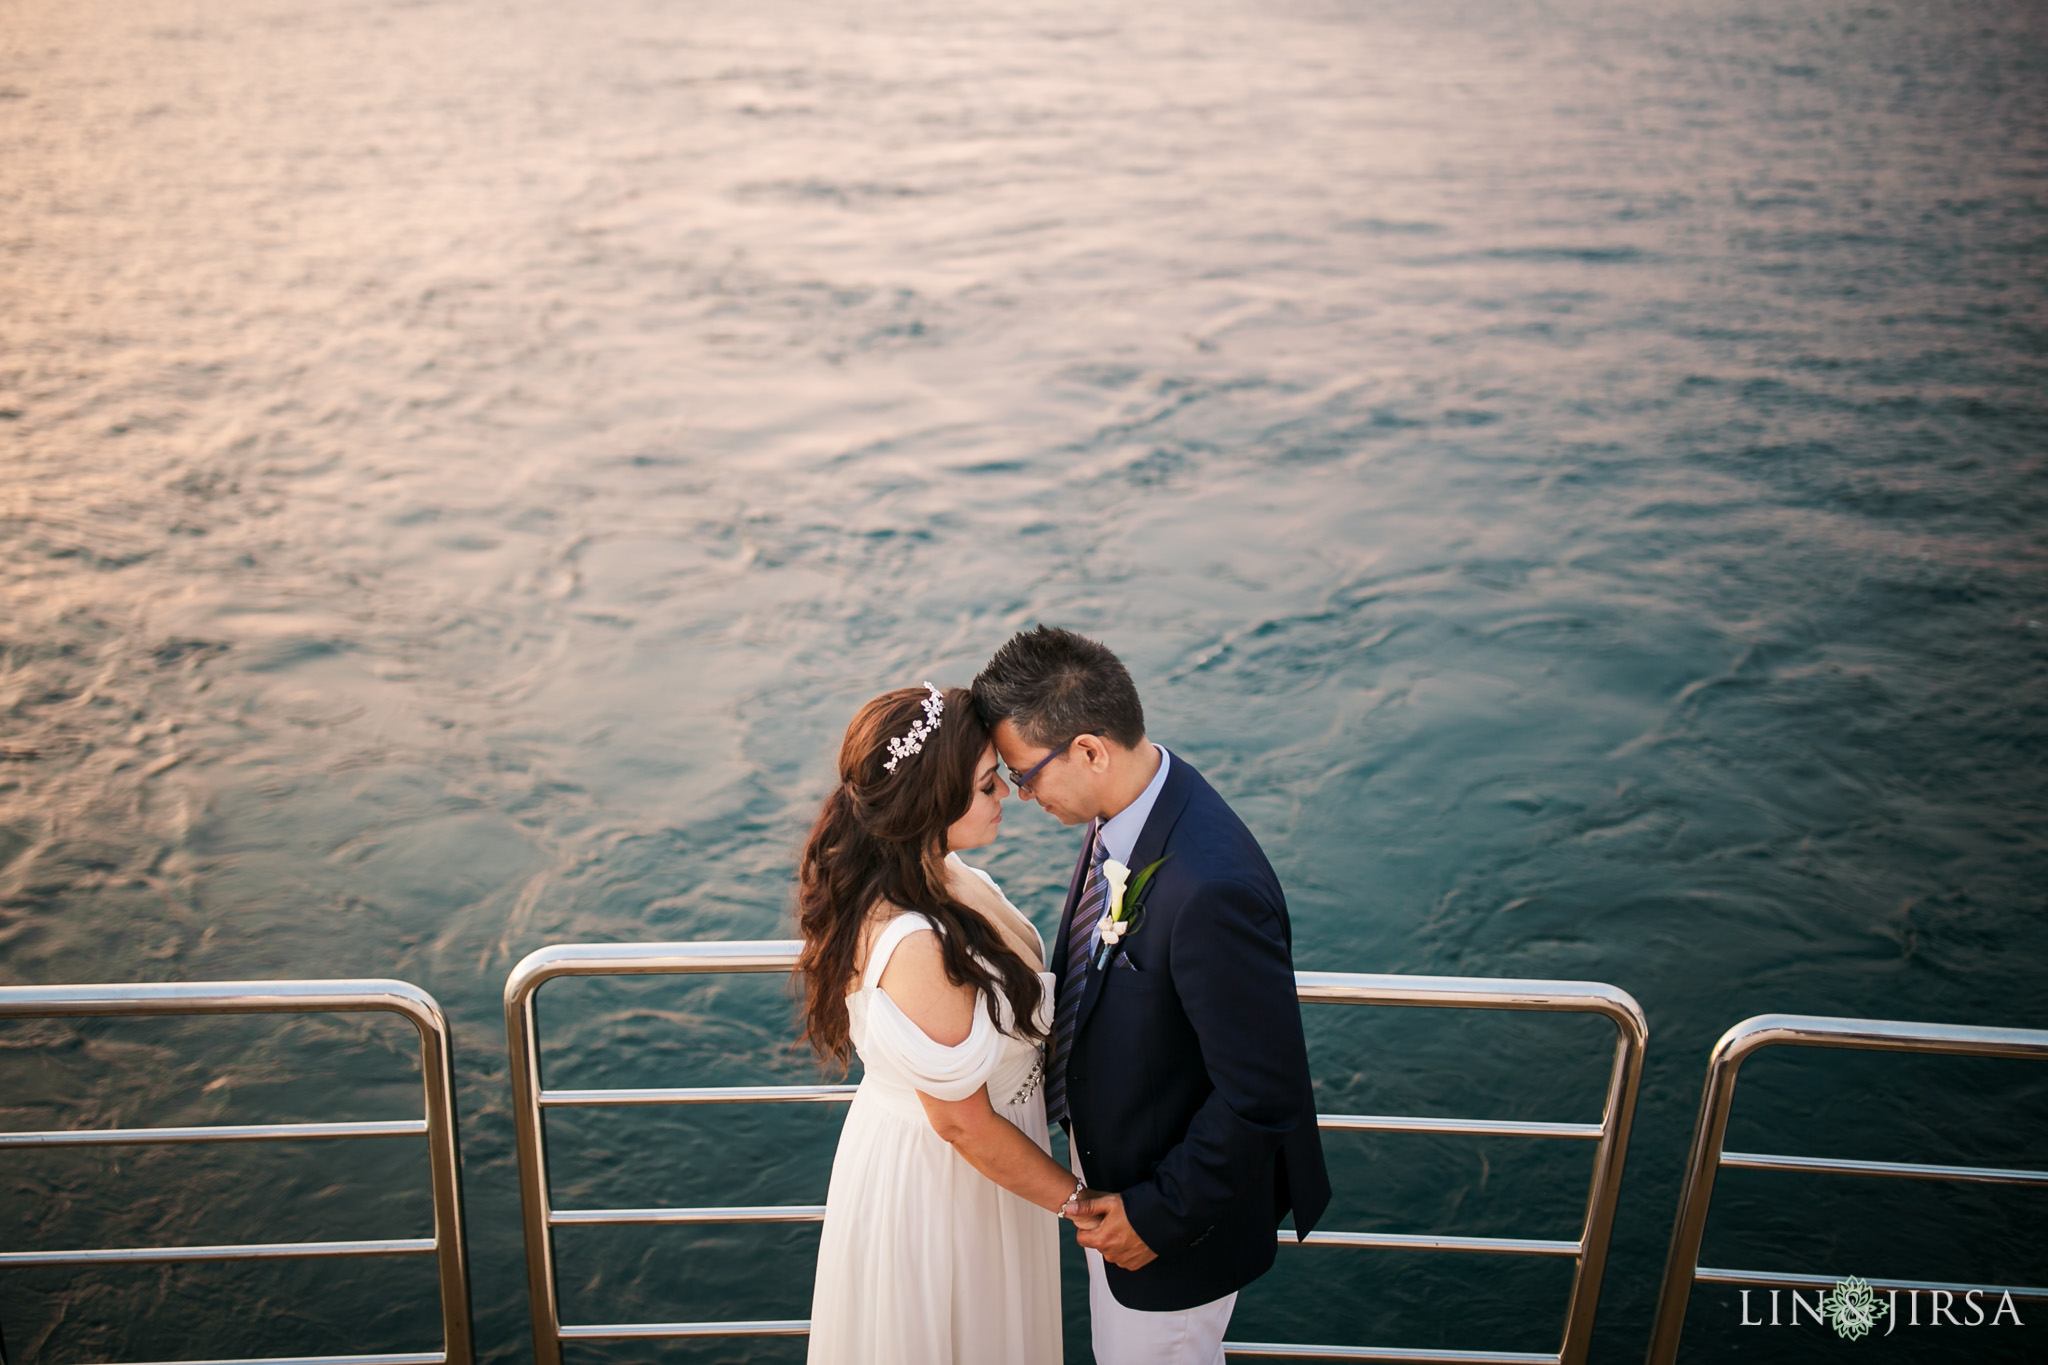 019 charter yachts newport beach wedding photography